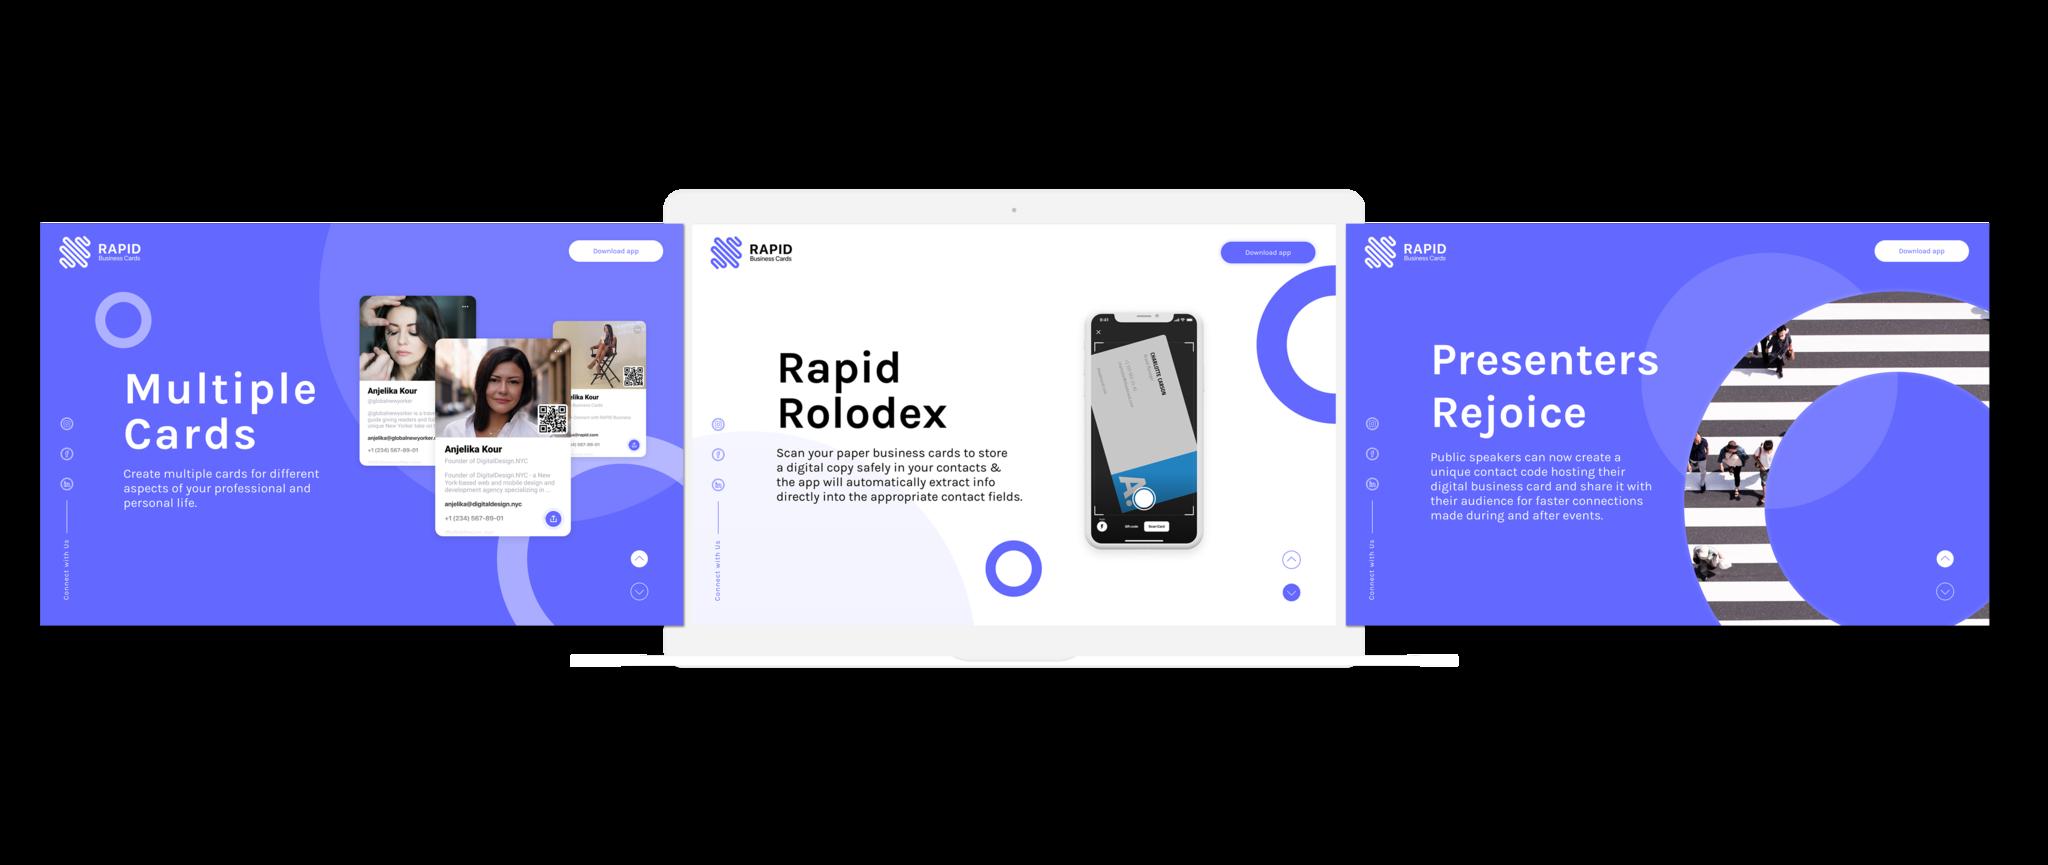 RAPID Business Cards - Development